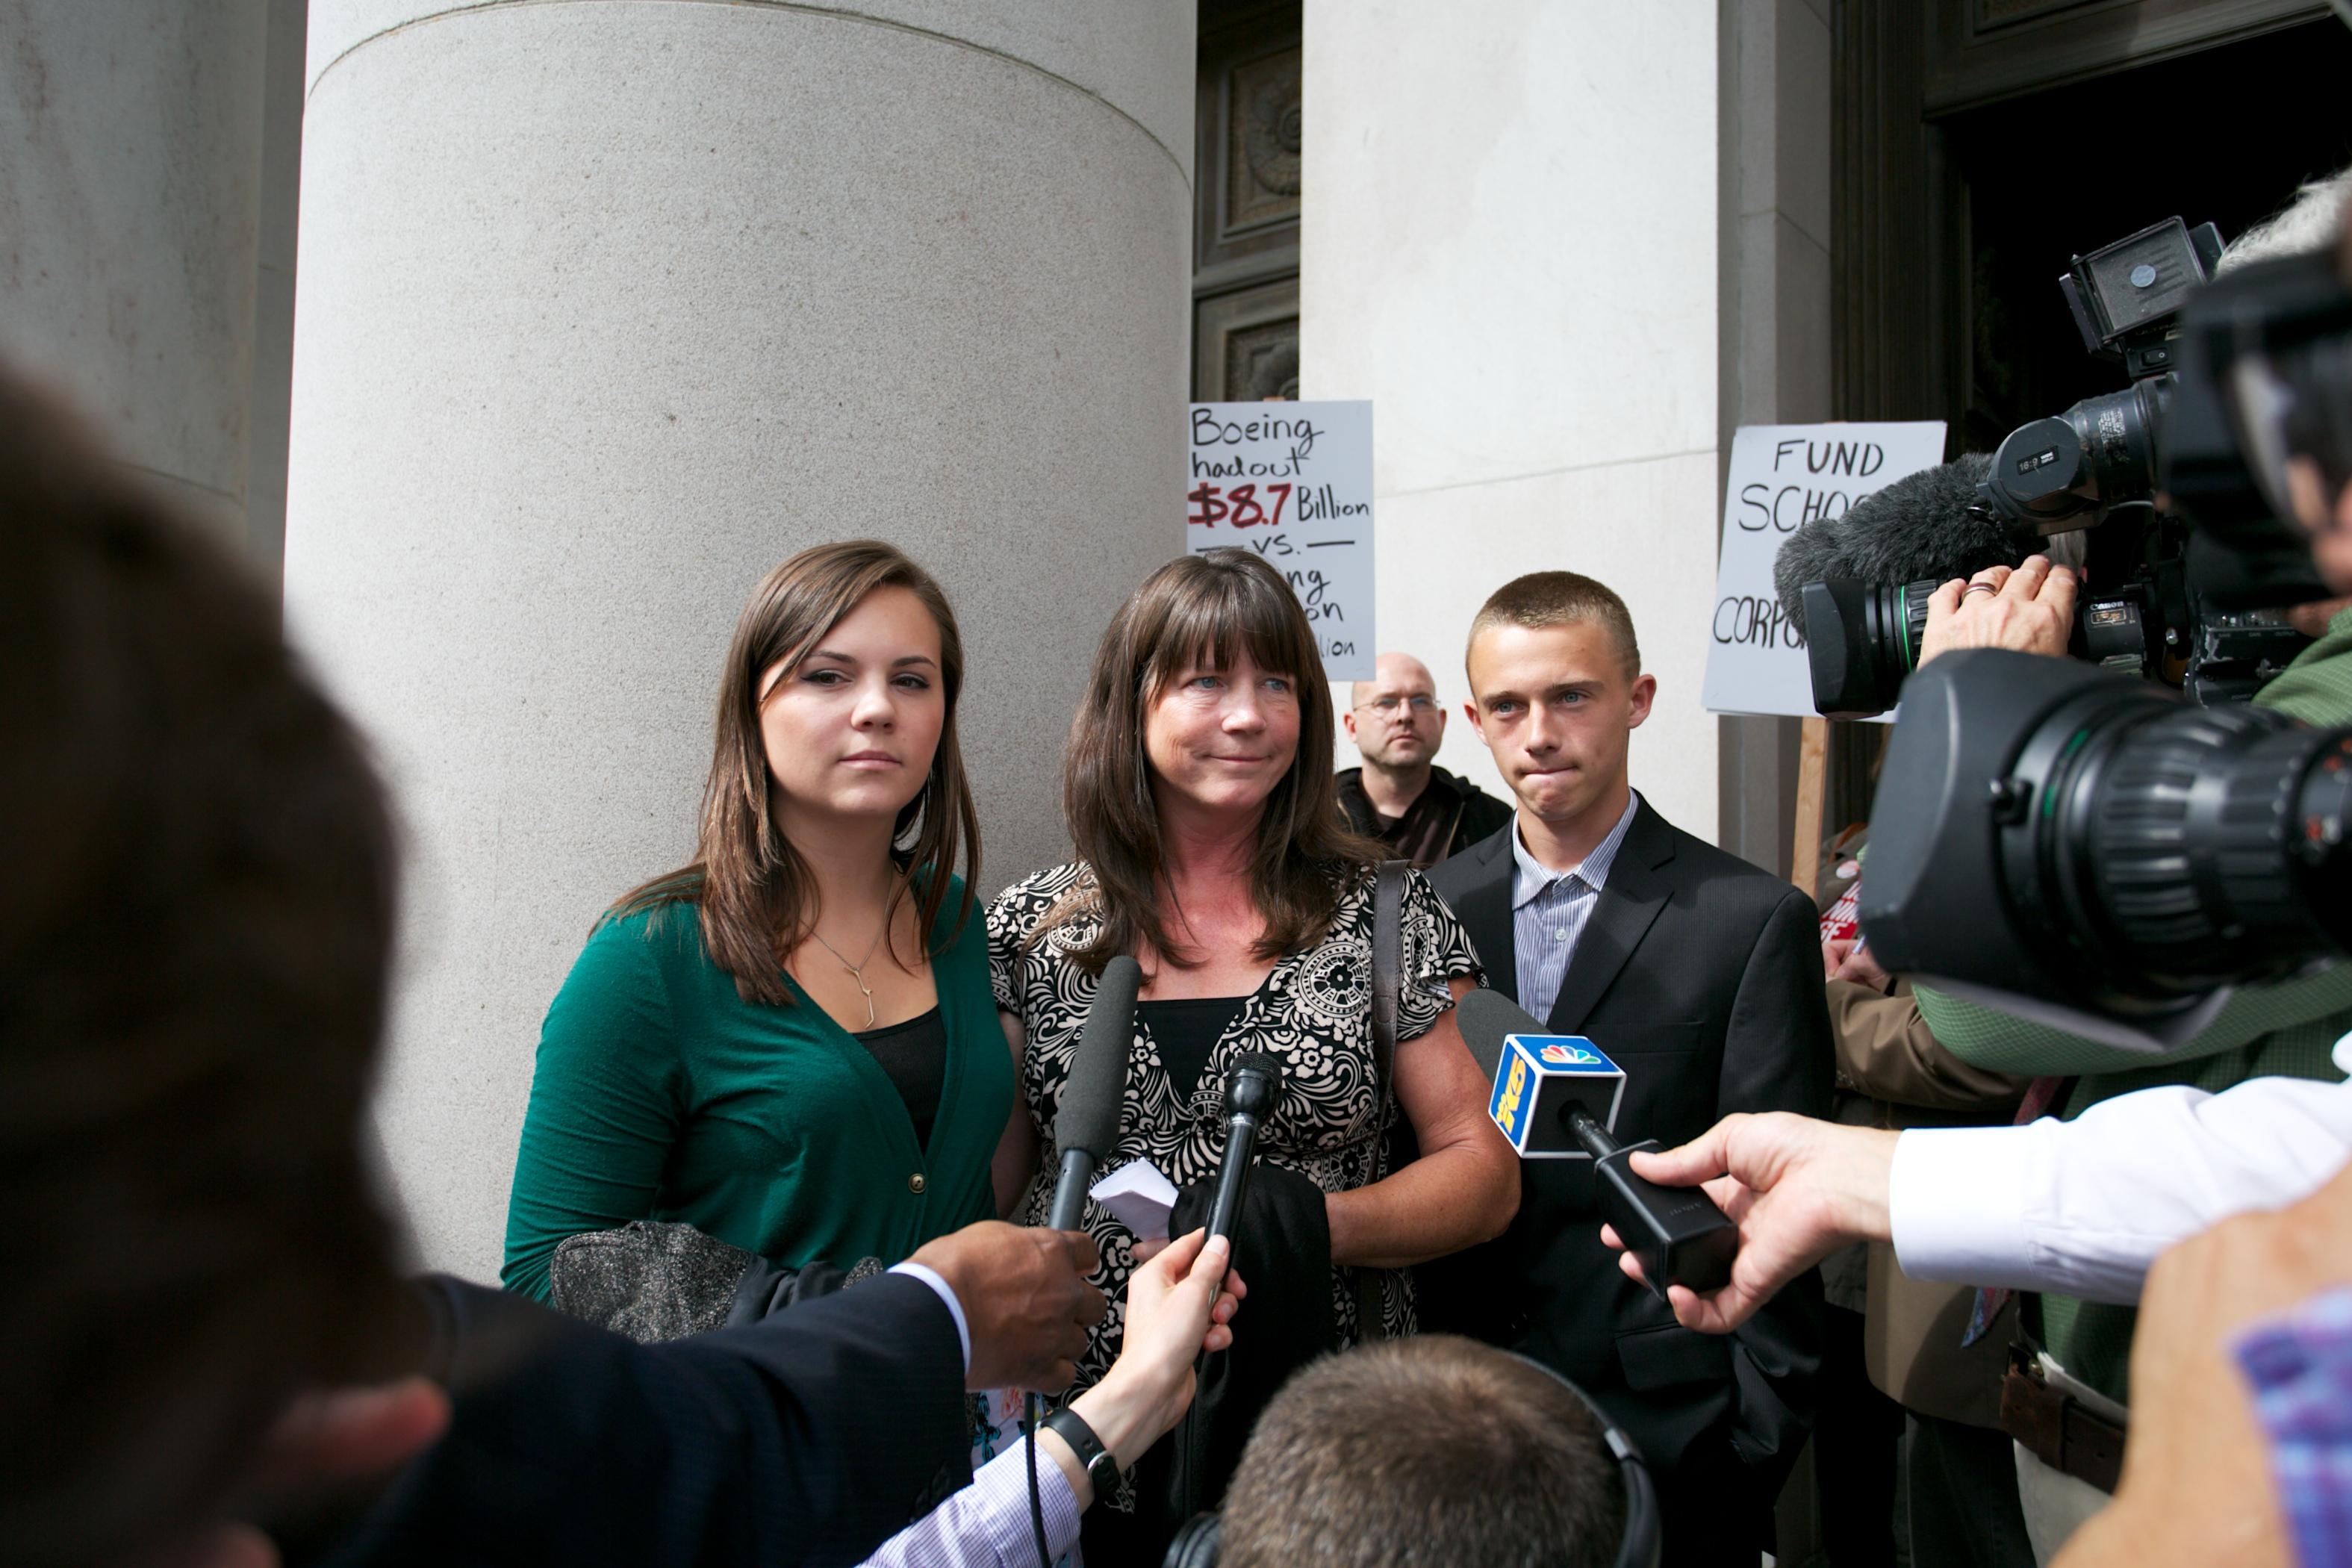 Stephanie McCleary, lead plaintiff in McCleary v. State